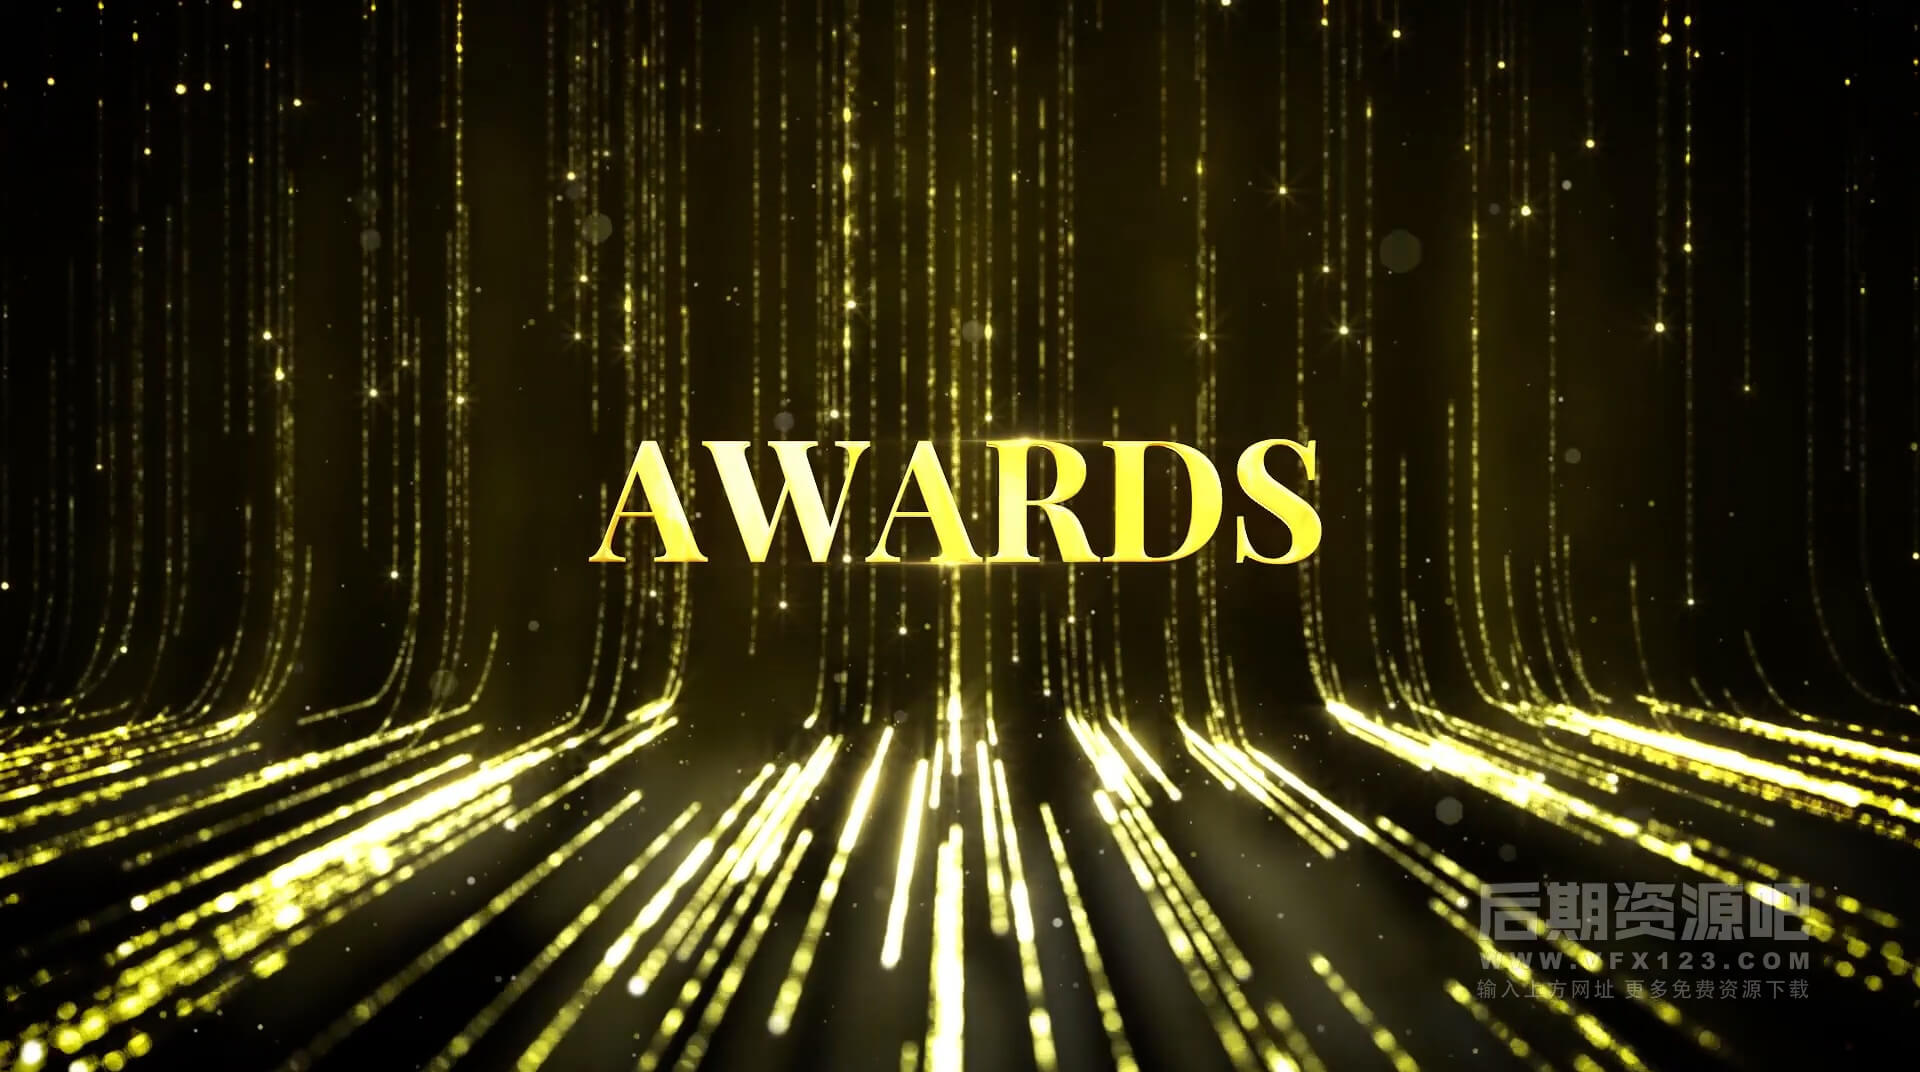 Fcpx主题插件 金色粒子背景年会颁奖典礼电影提名婚礼片头开场模板